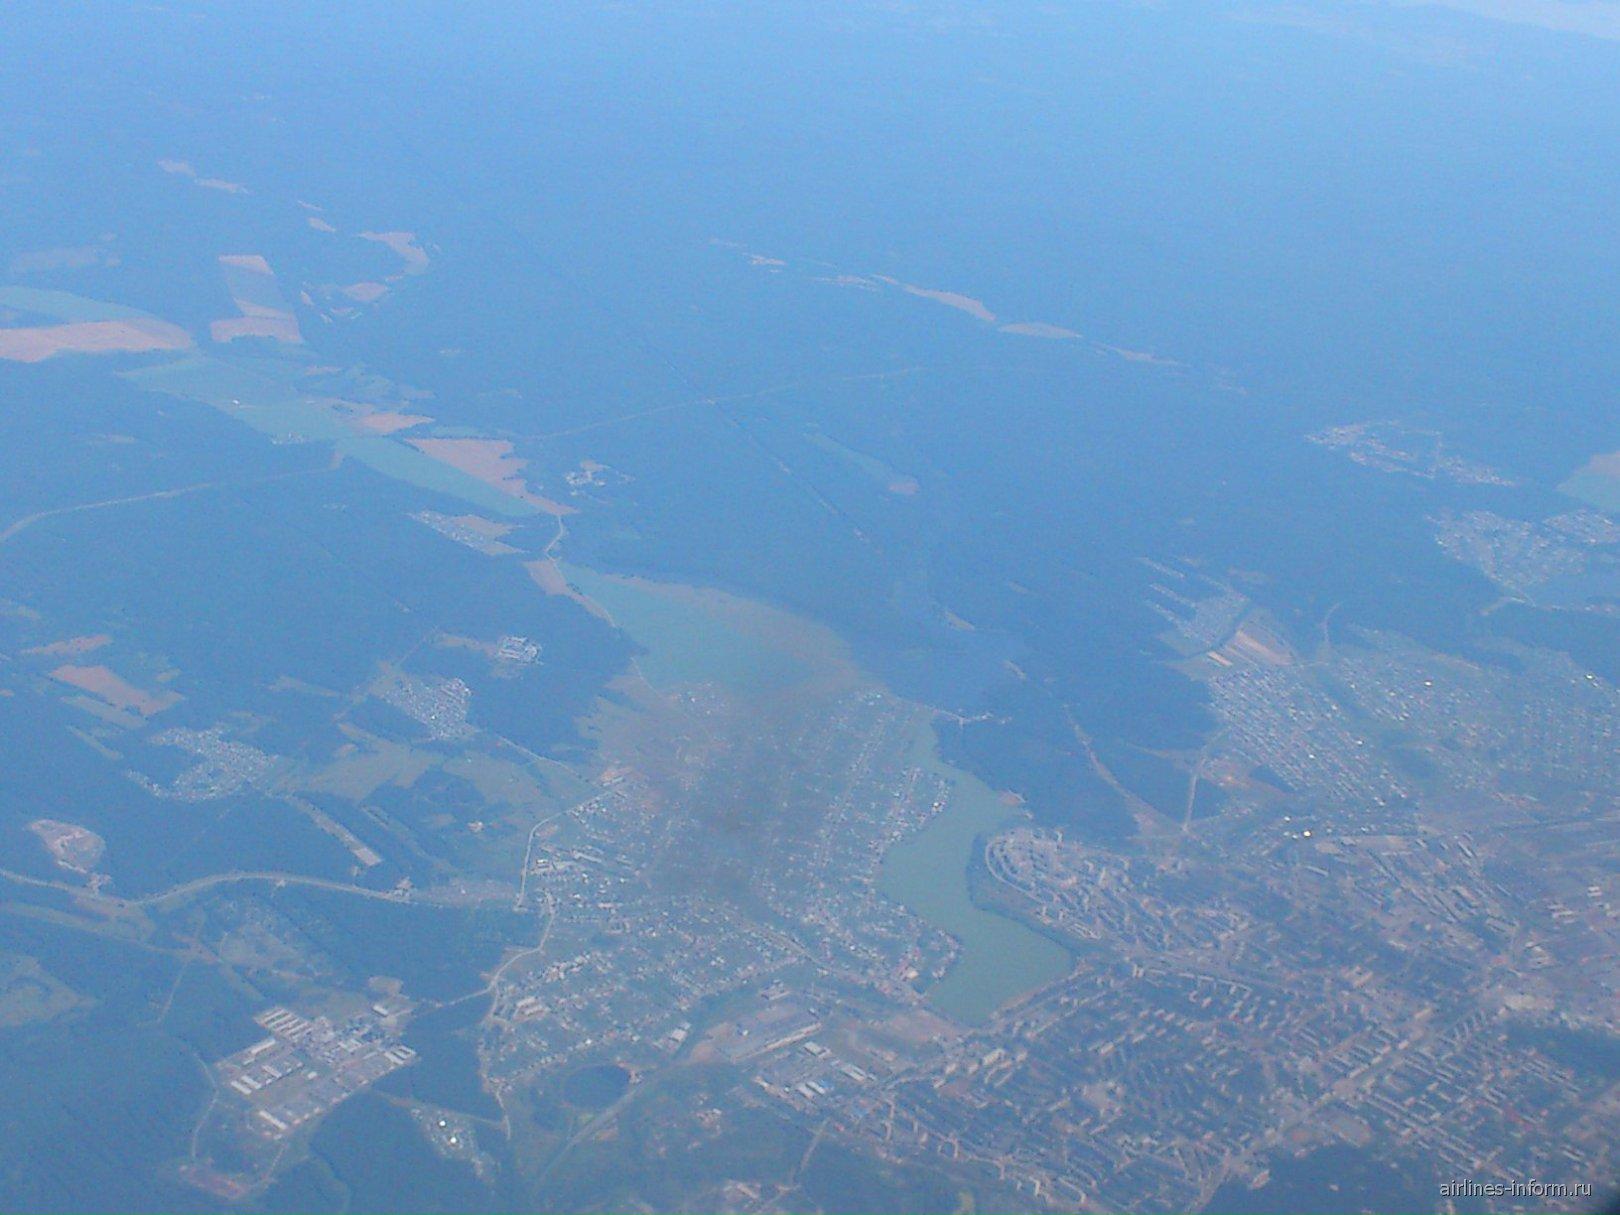 Ёбург с высоты